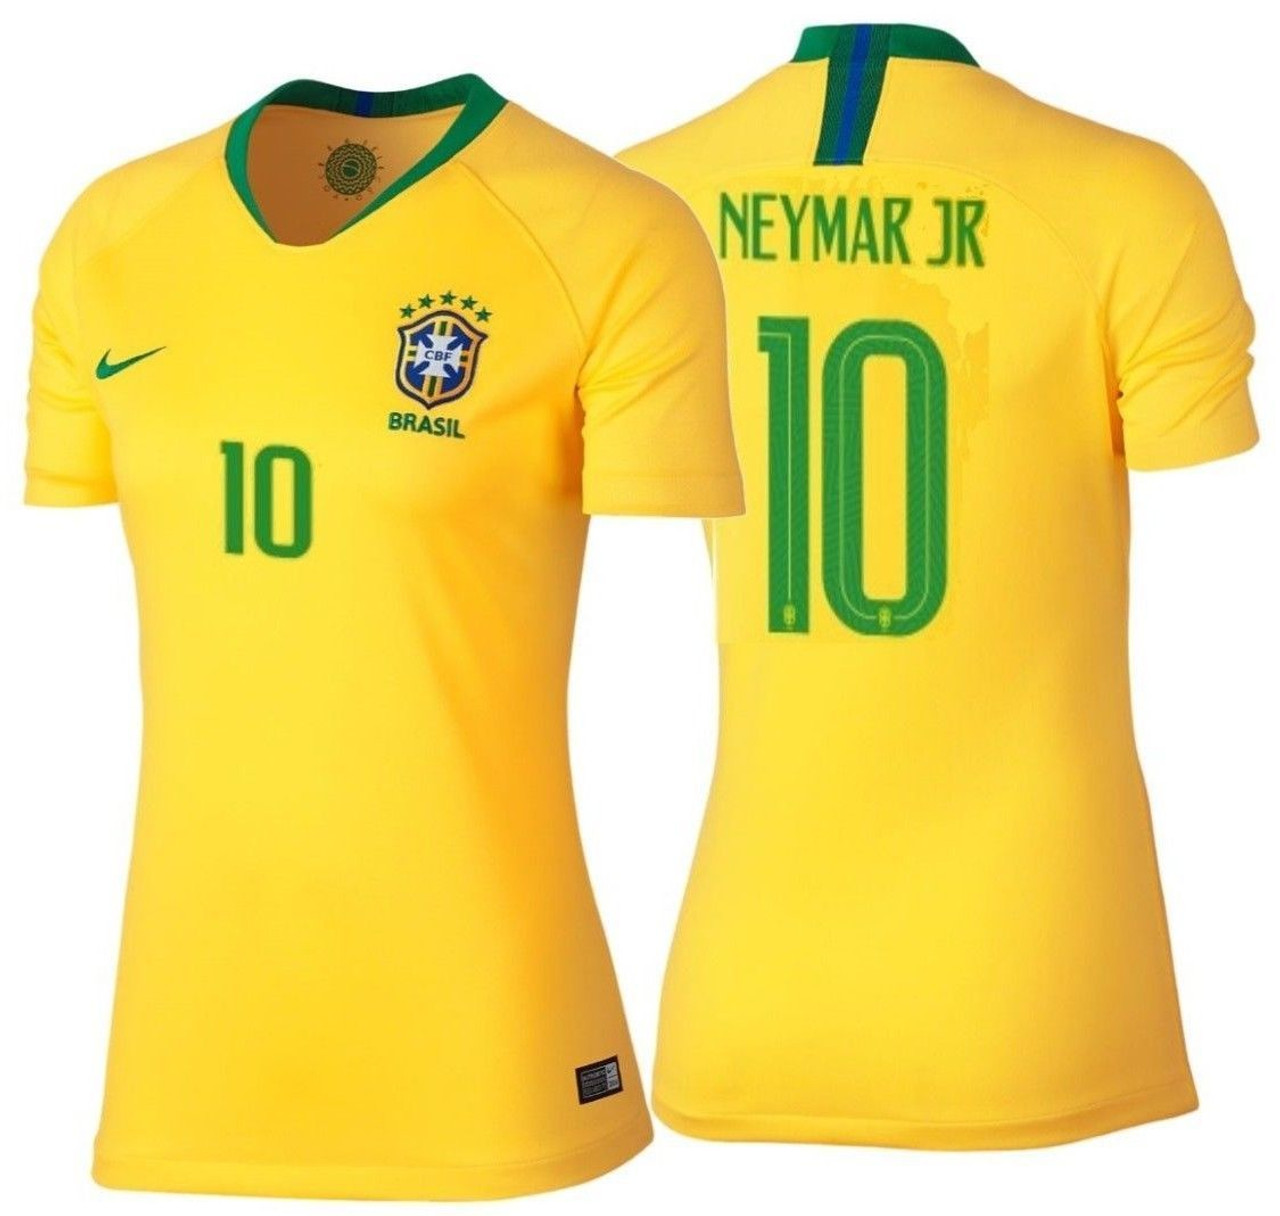 1a7bfabf8 NIKE BRAZIL 2018 WOMEN S HOME `NEYMAR`JERSEY - Soccer Plus